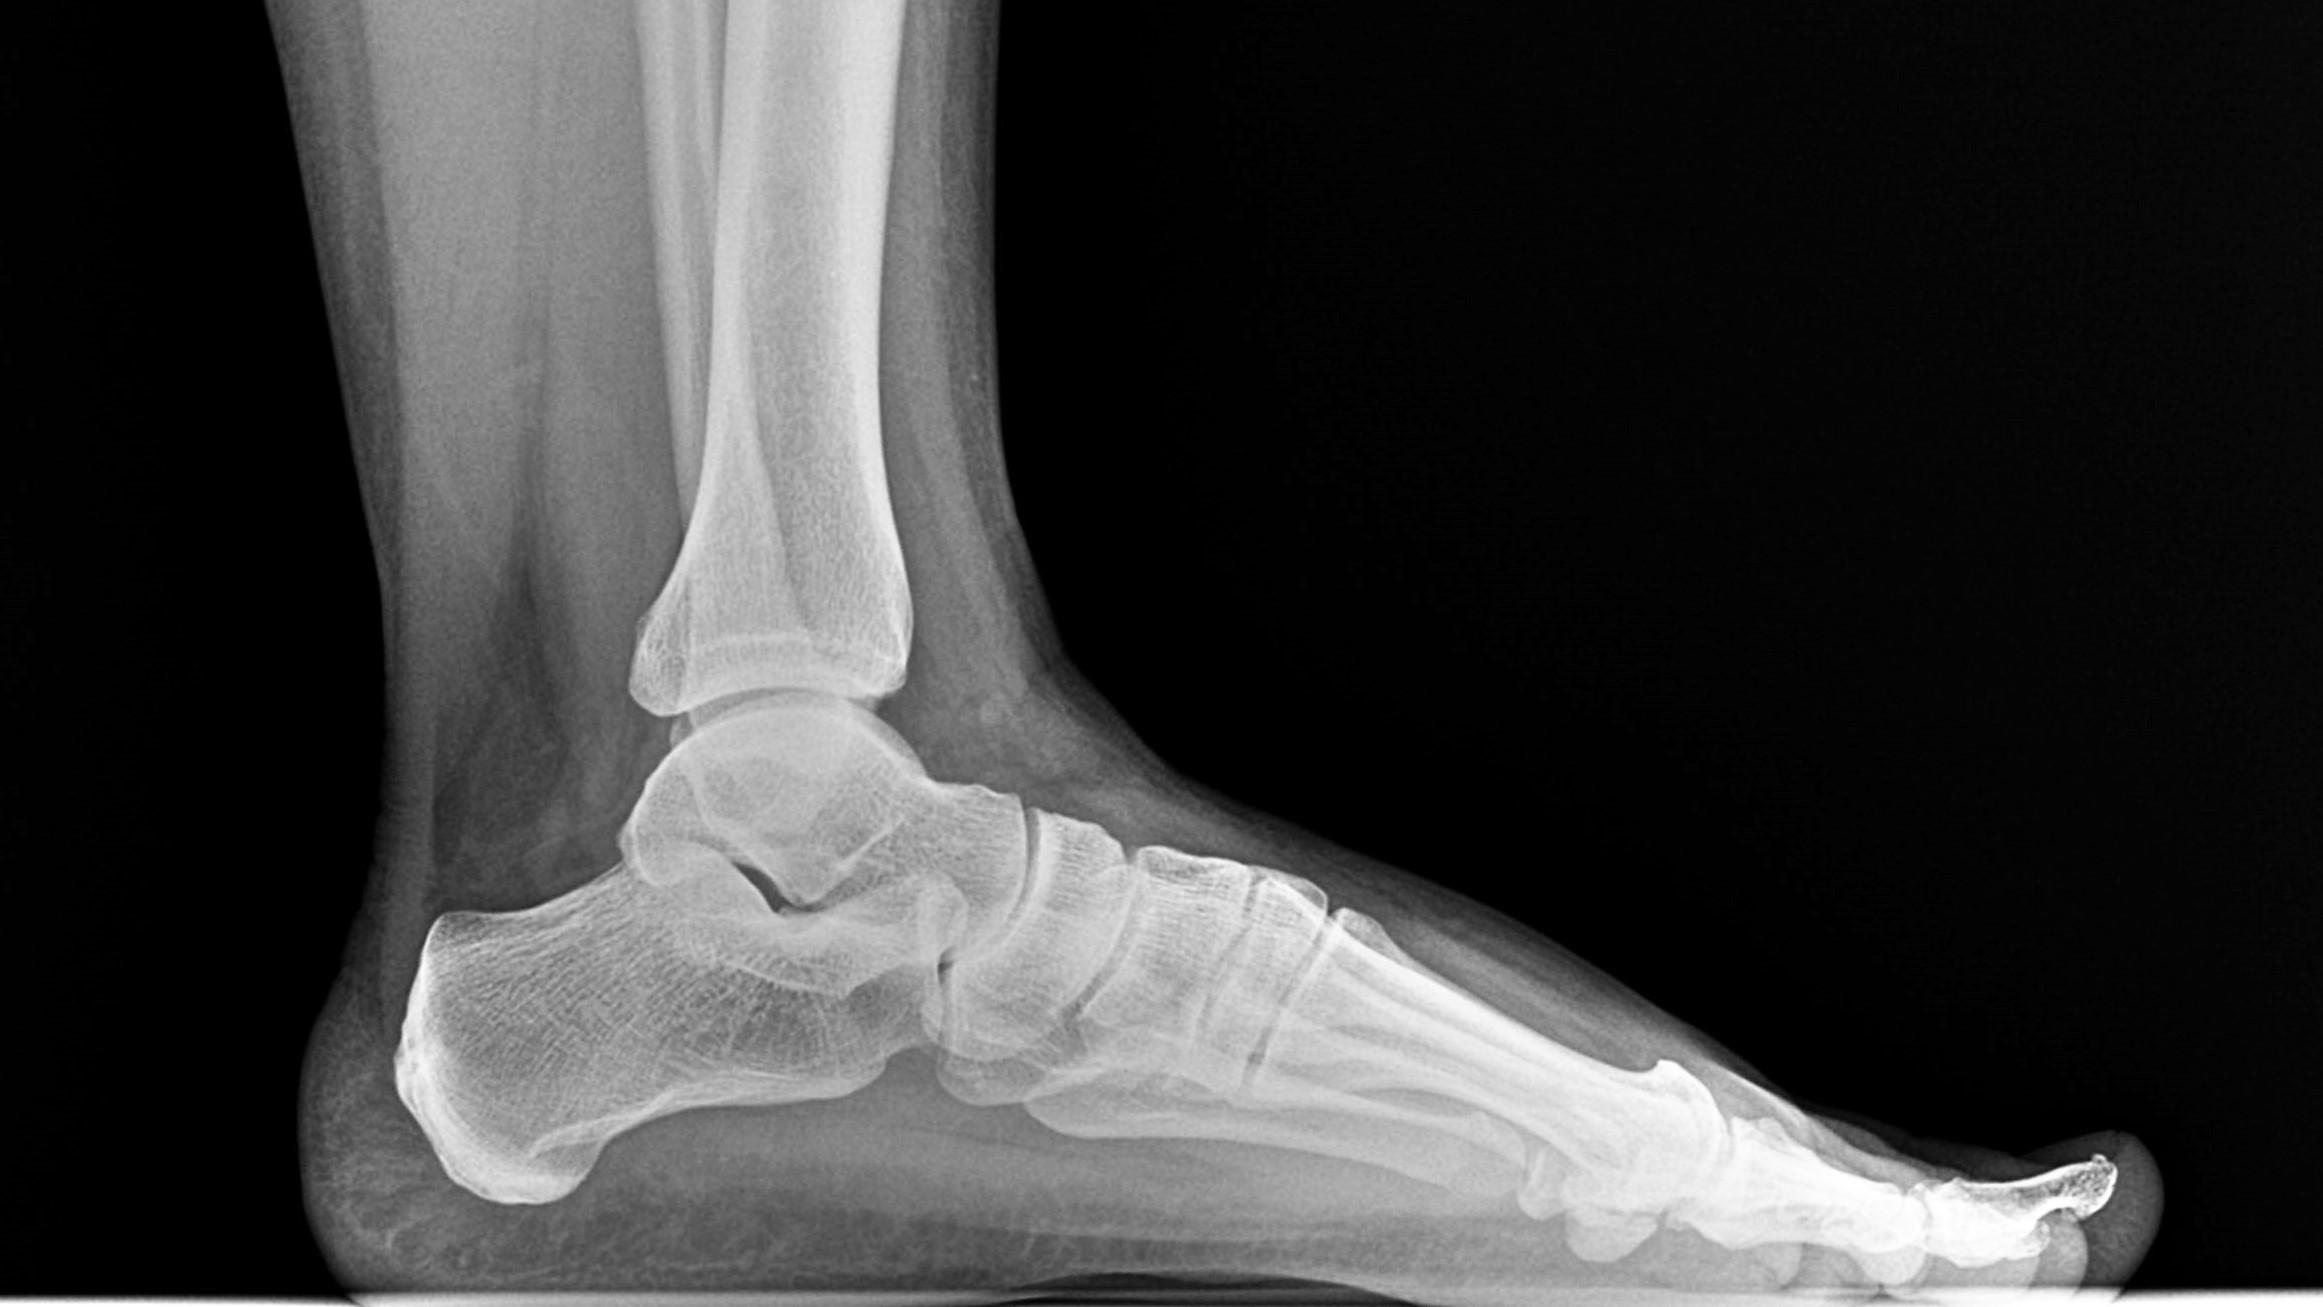 Washburn Foot & Ankle Center image 6